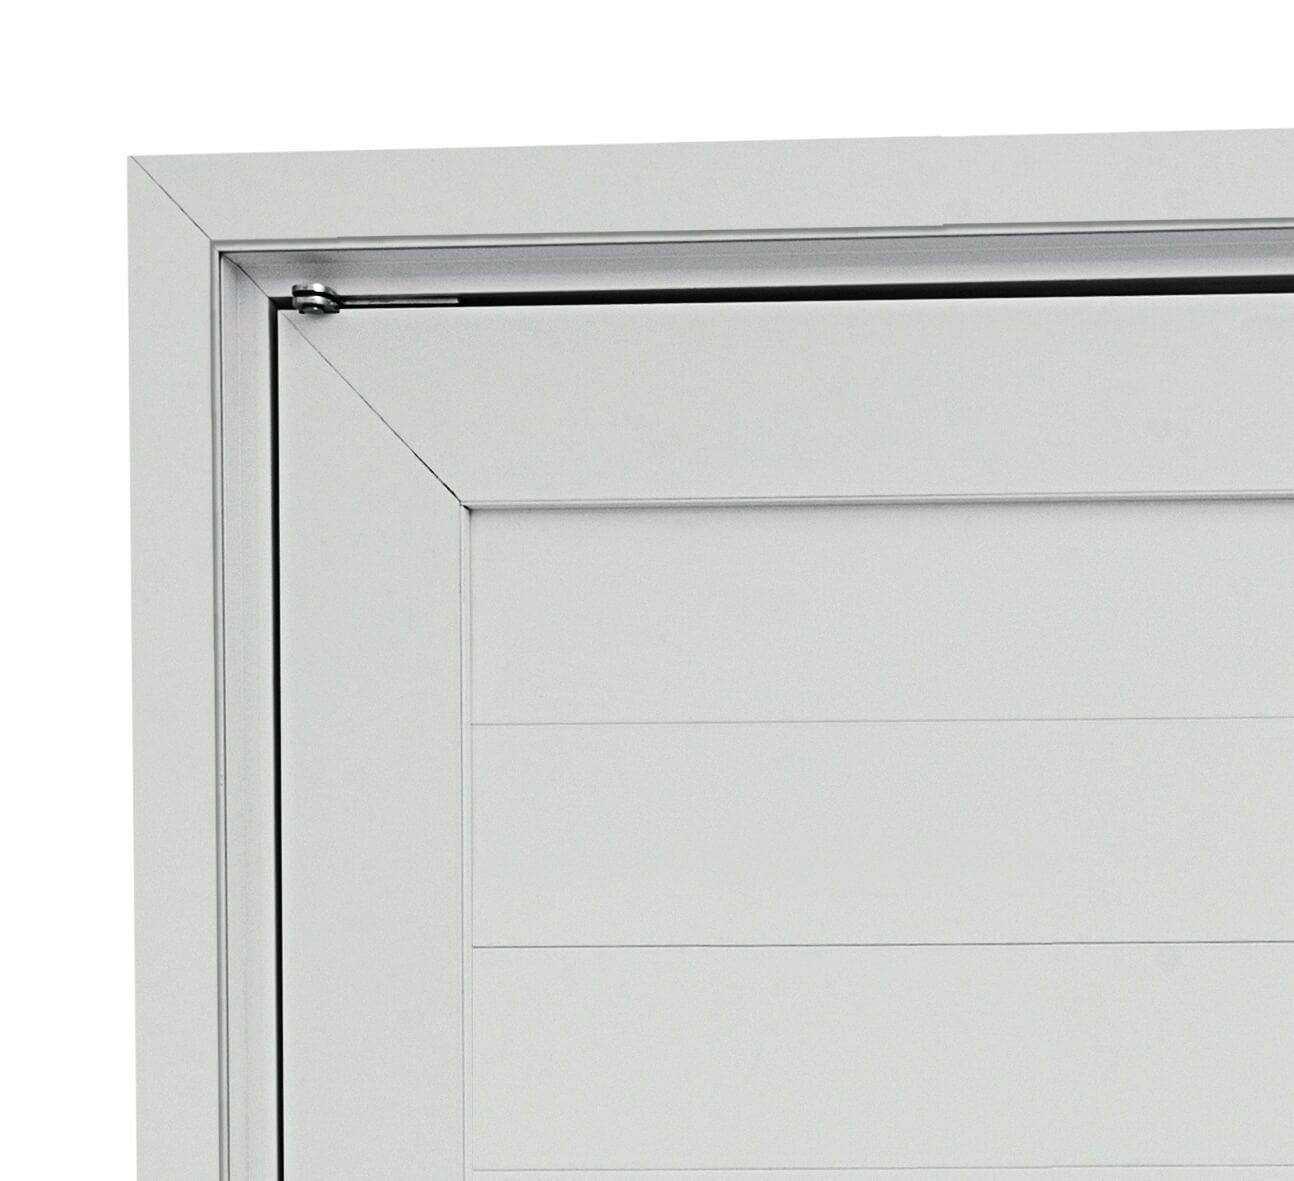 Aluminium Guarnição - 243.5x146.2x12.0 Ref. 72.92.823-7 Sasazaki